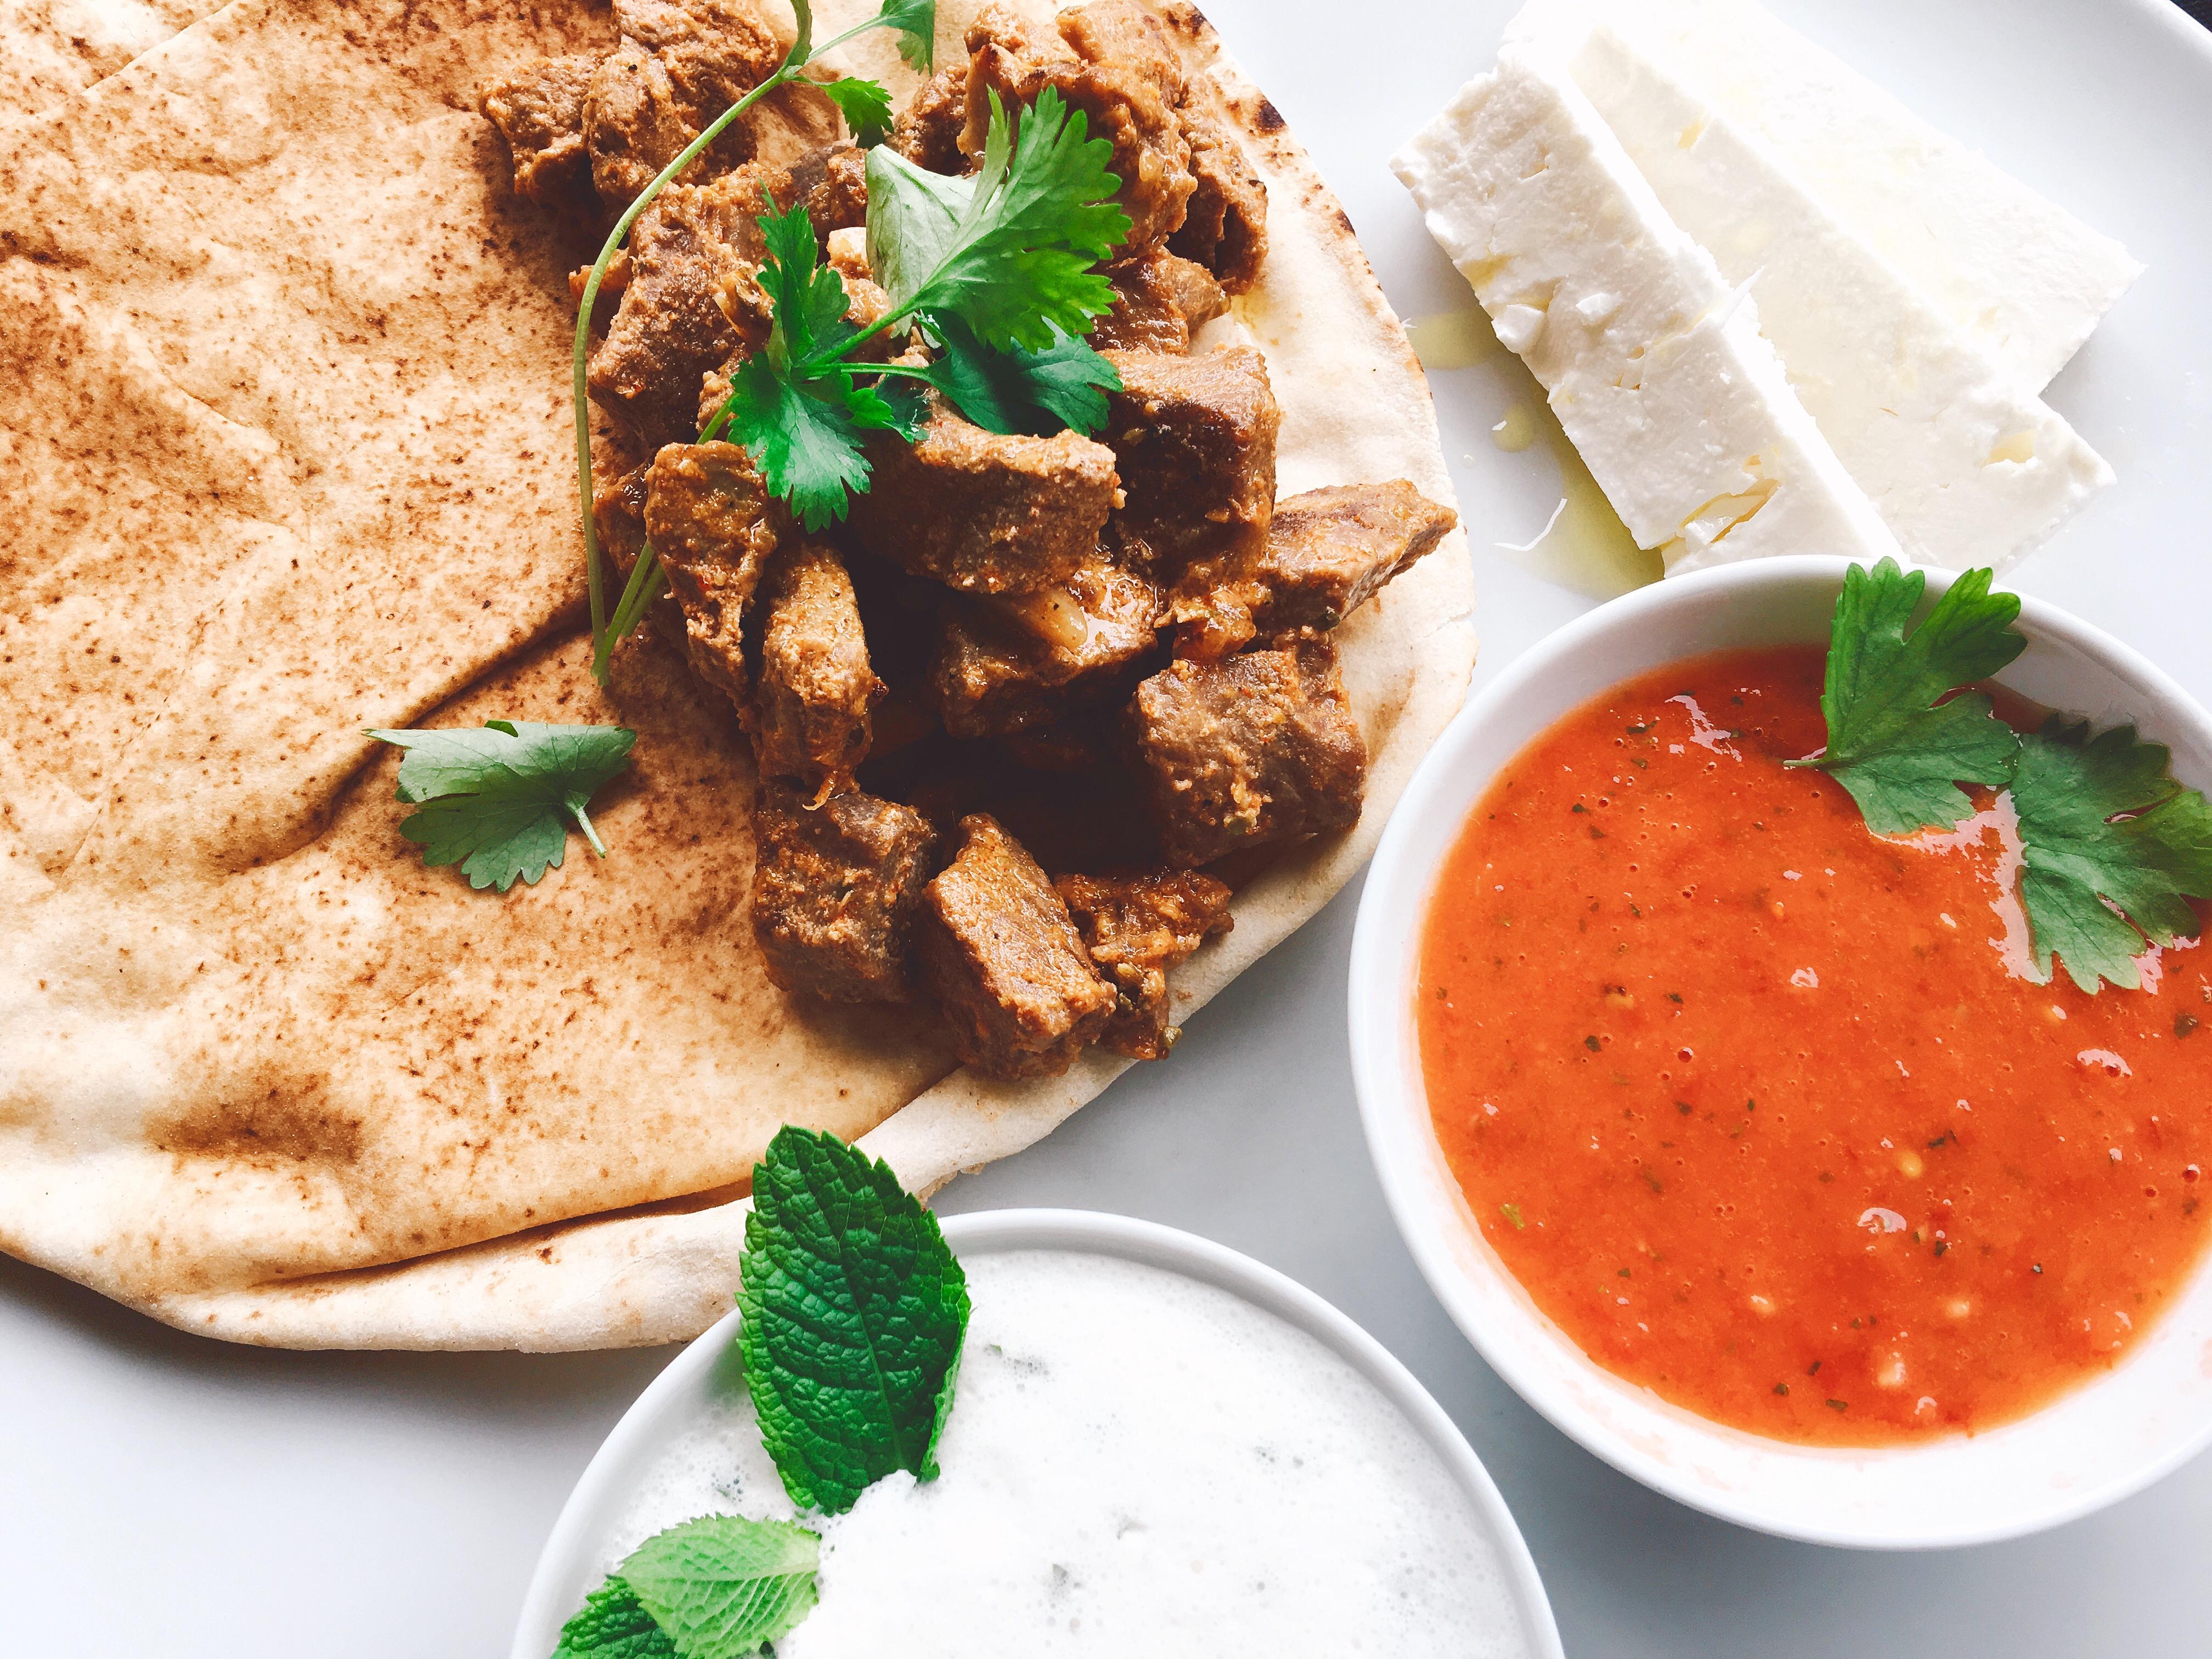 Lammfilet mit Tomaten Relish, Joghurt-Minz Sosse und Feta